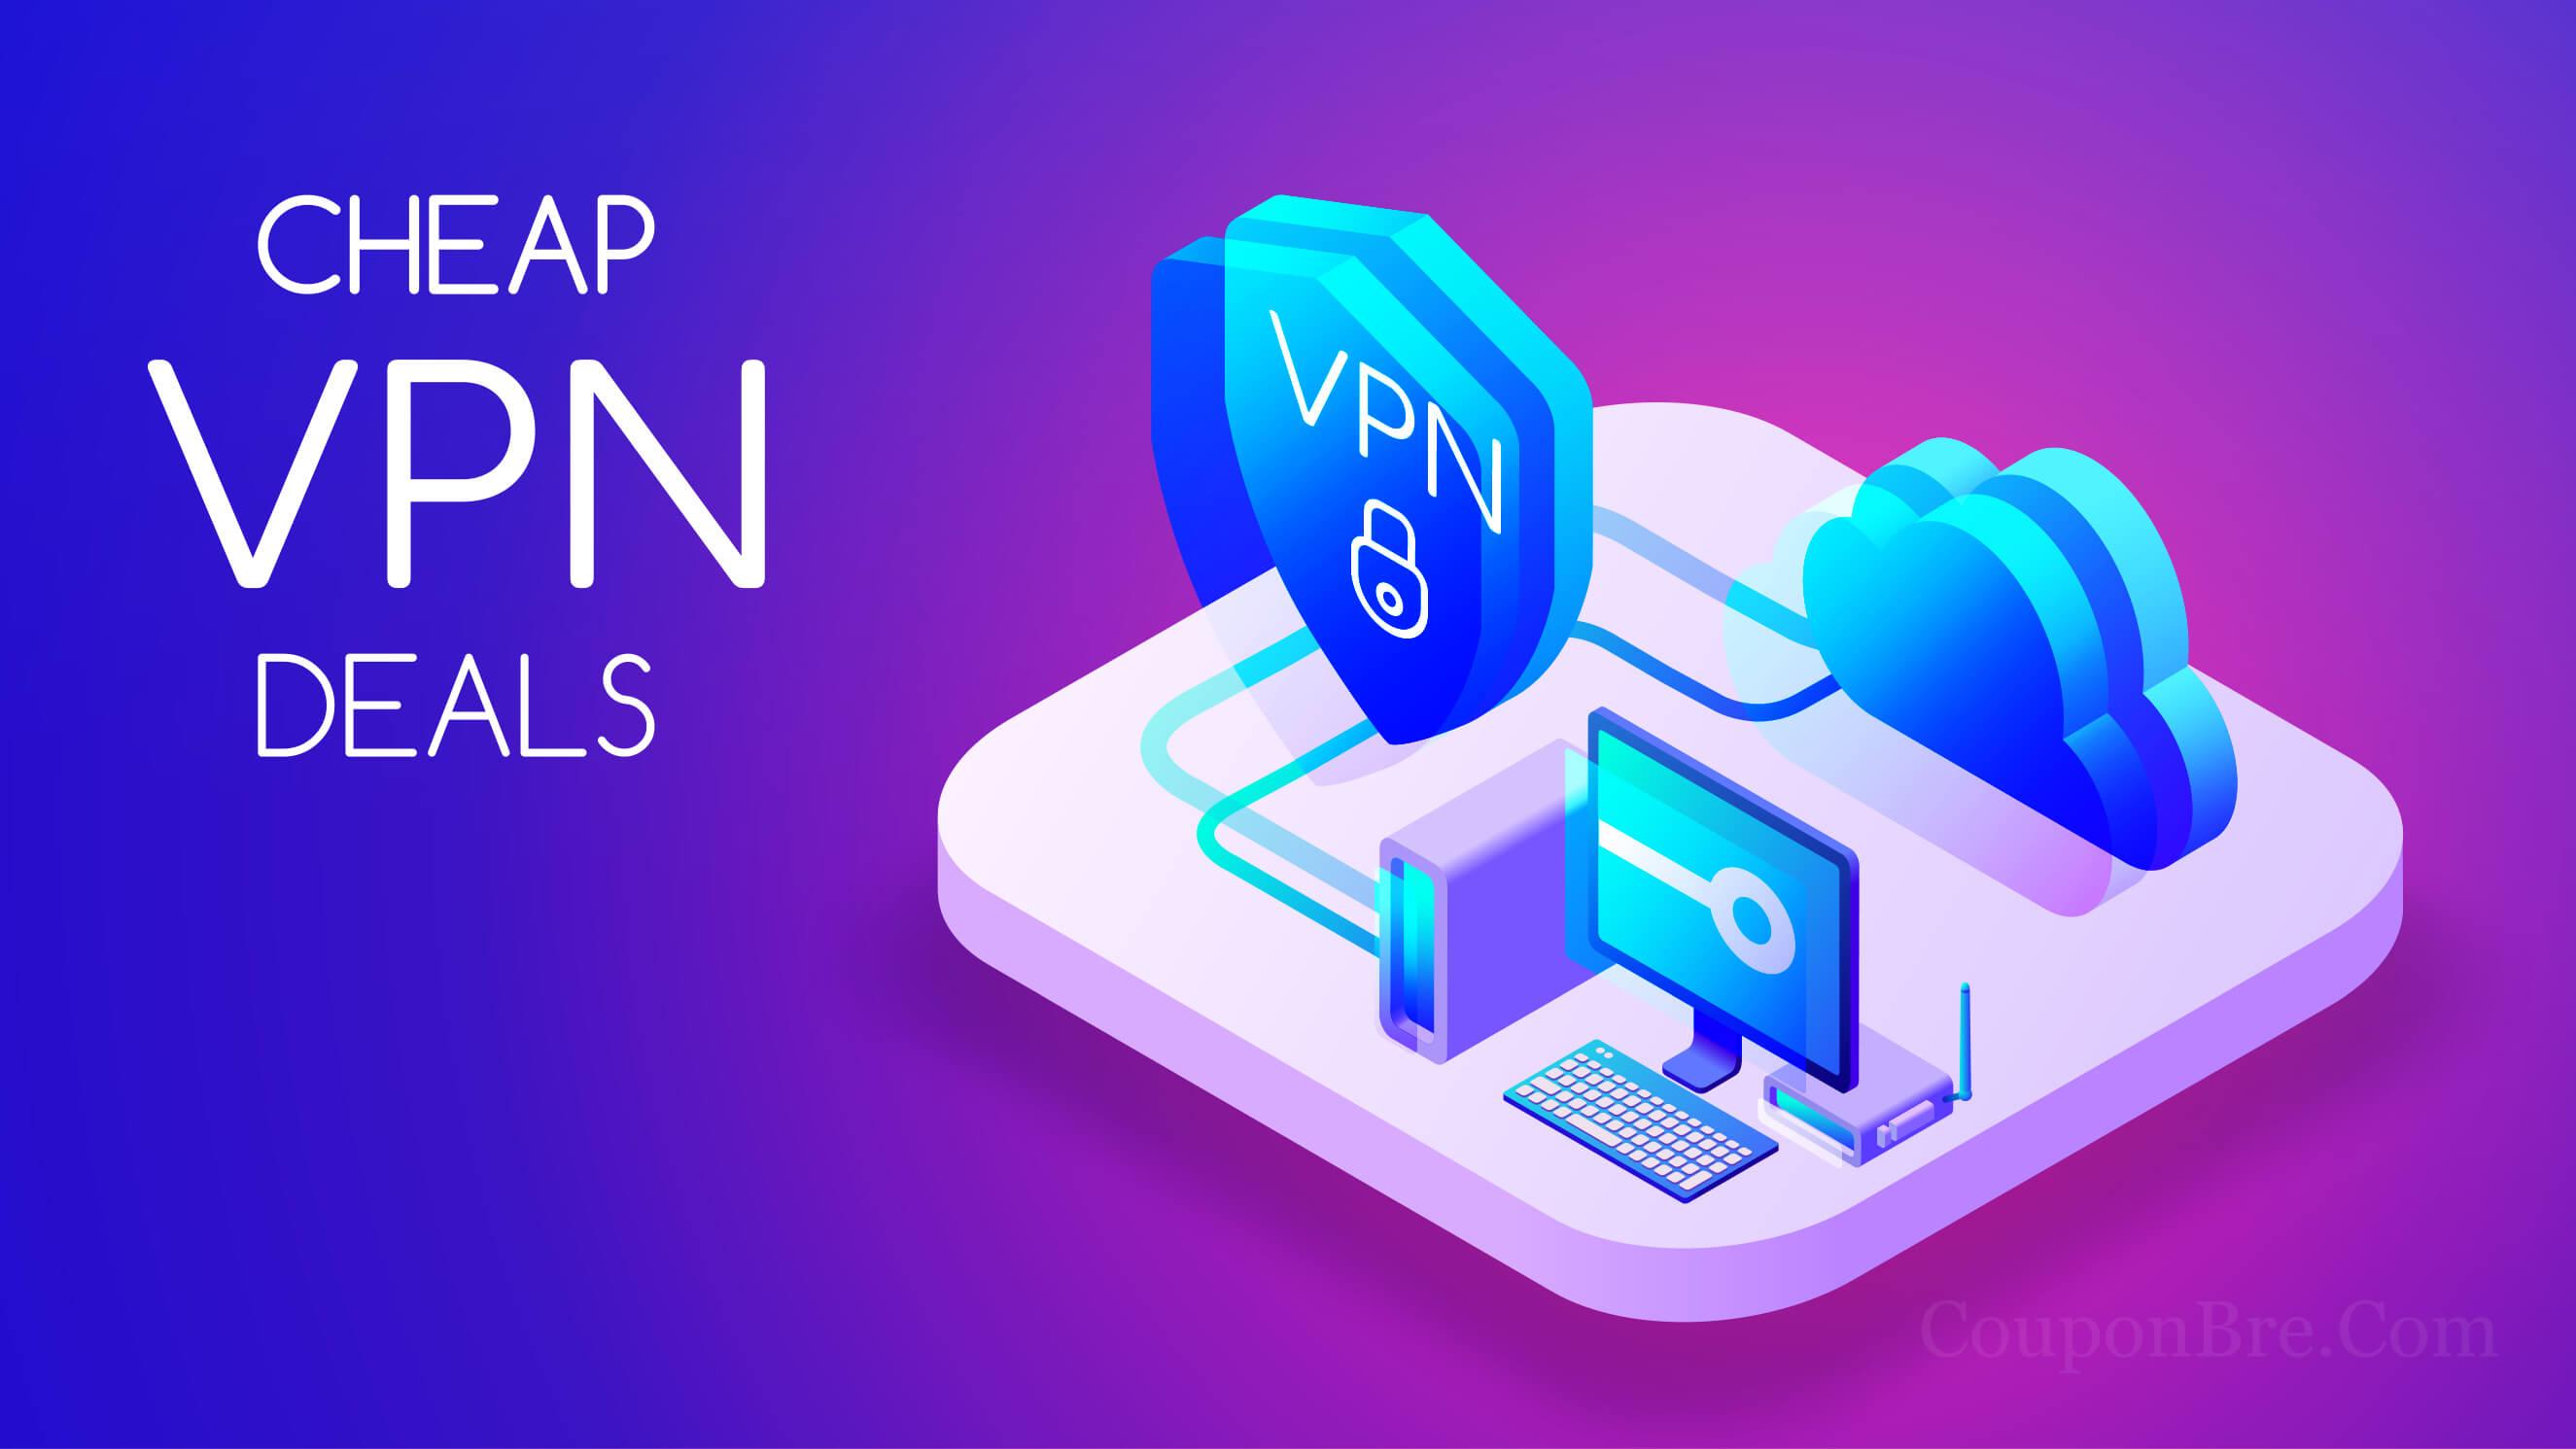 Buy Cheap VPN